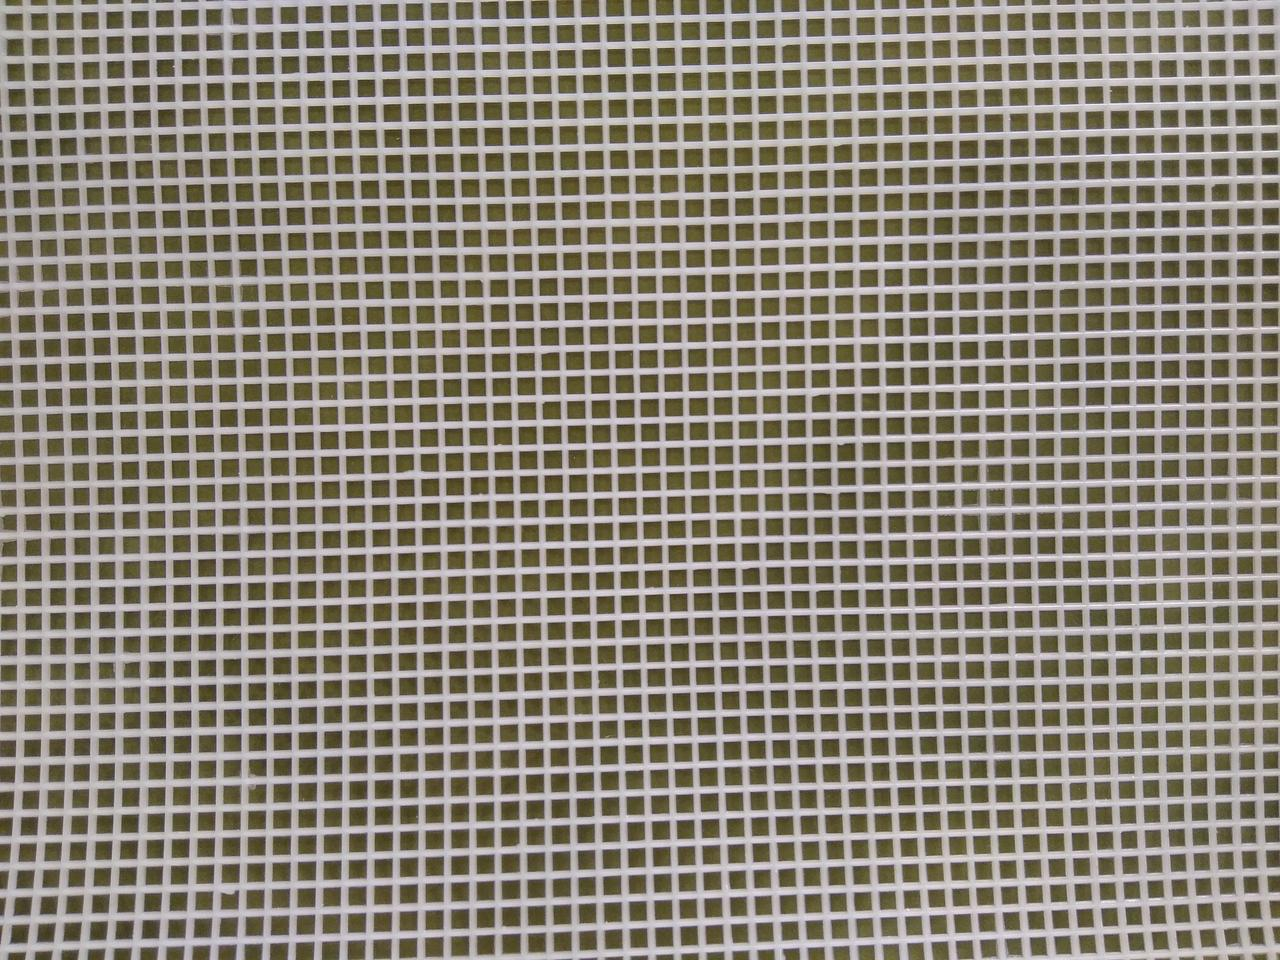 Канва виниловая белая (1,5кл/1см) , 50см х32.5 см